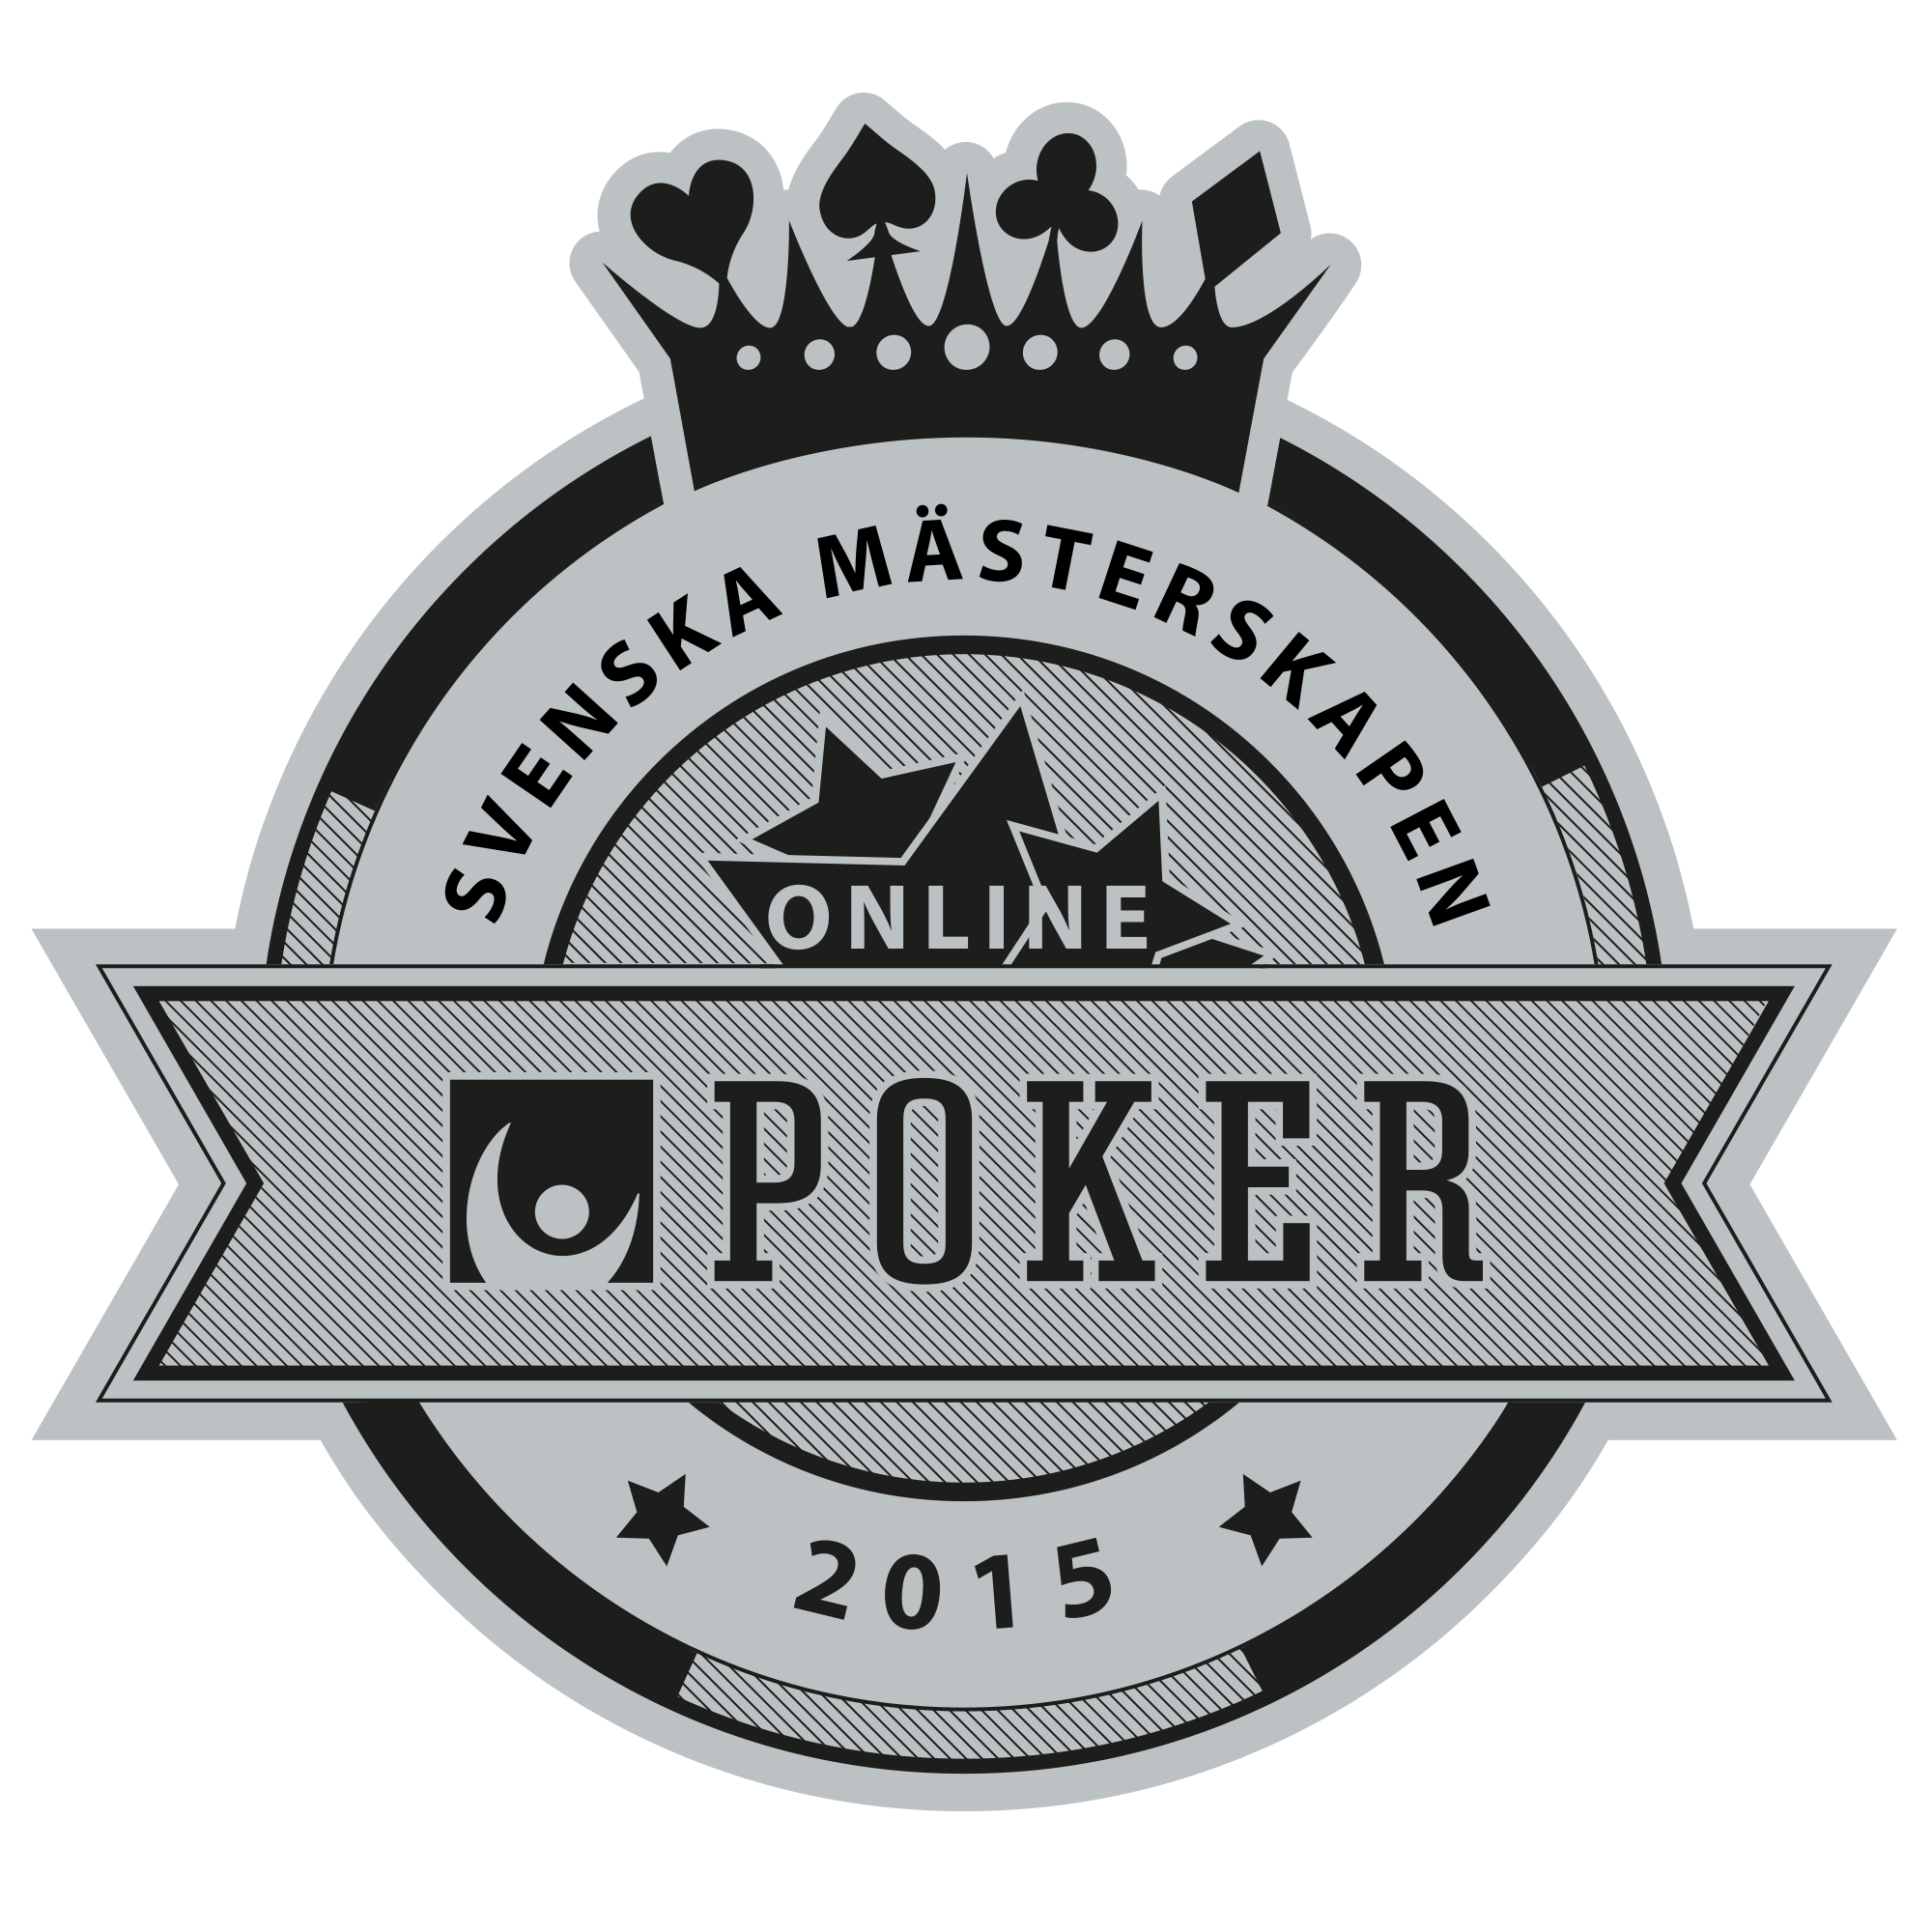 poker sm svenska spel kvla